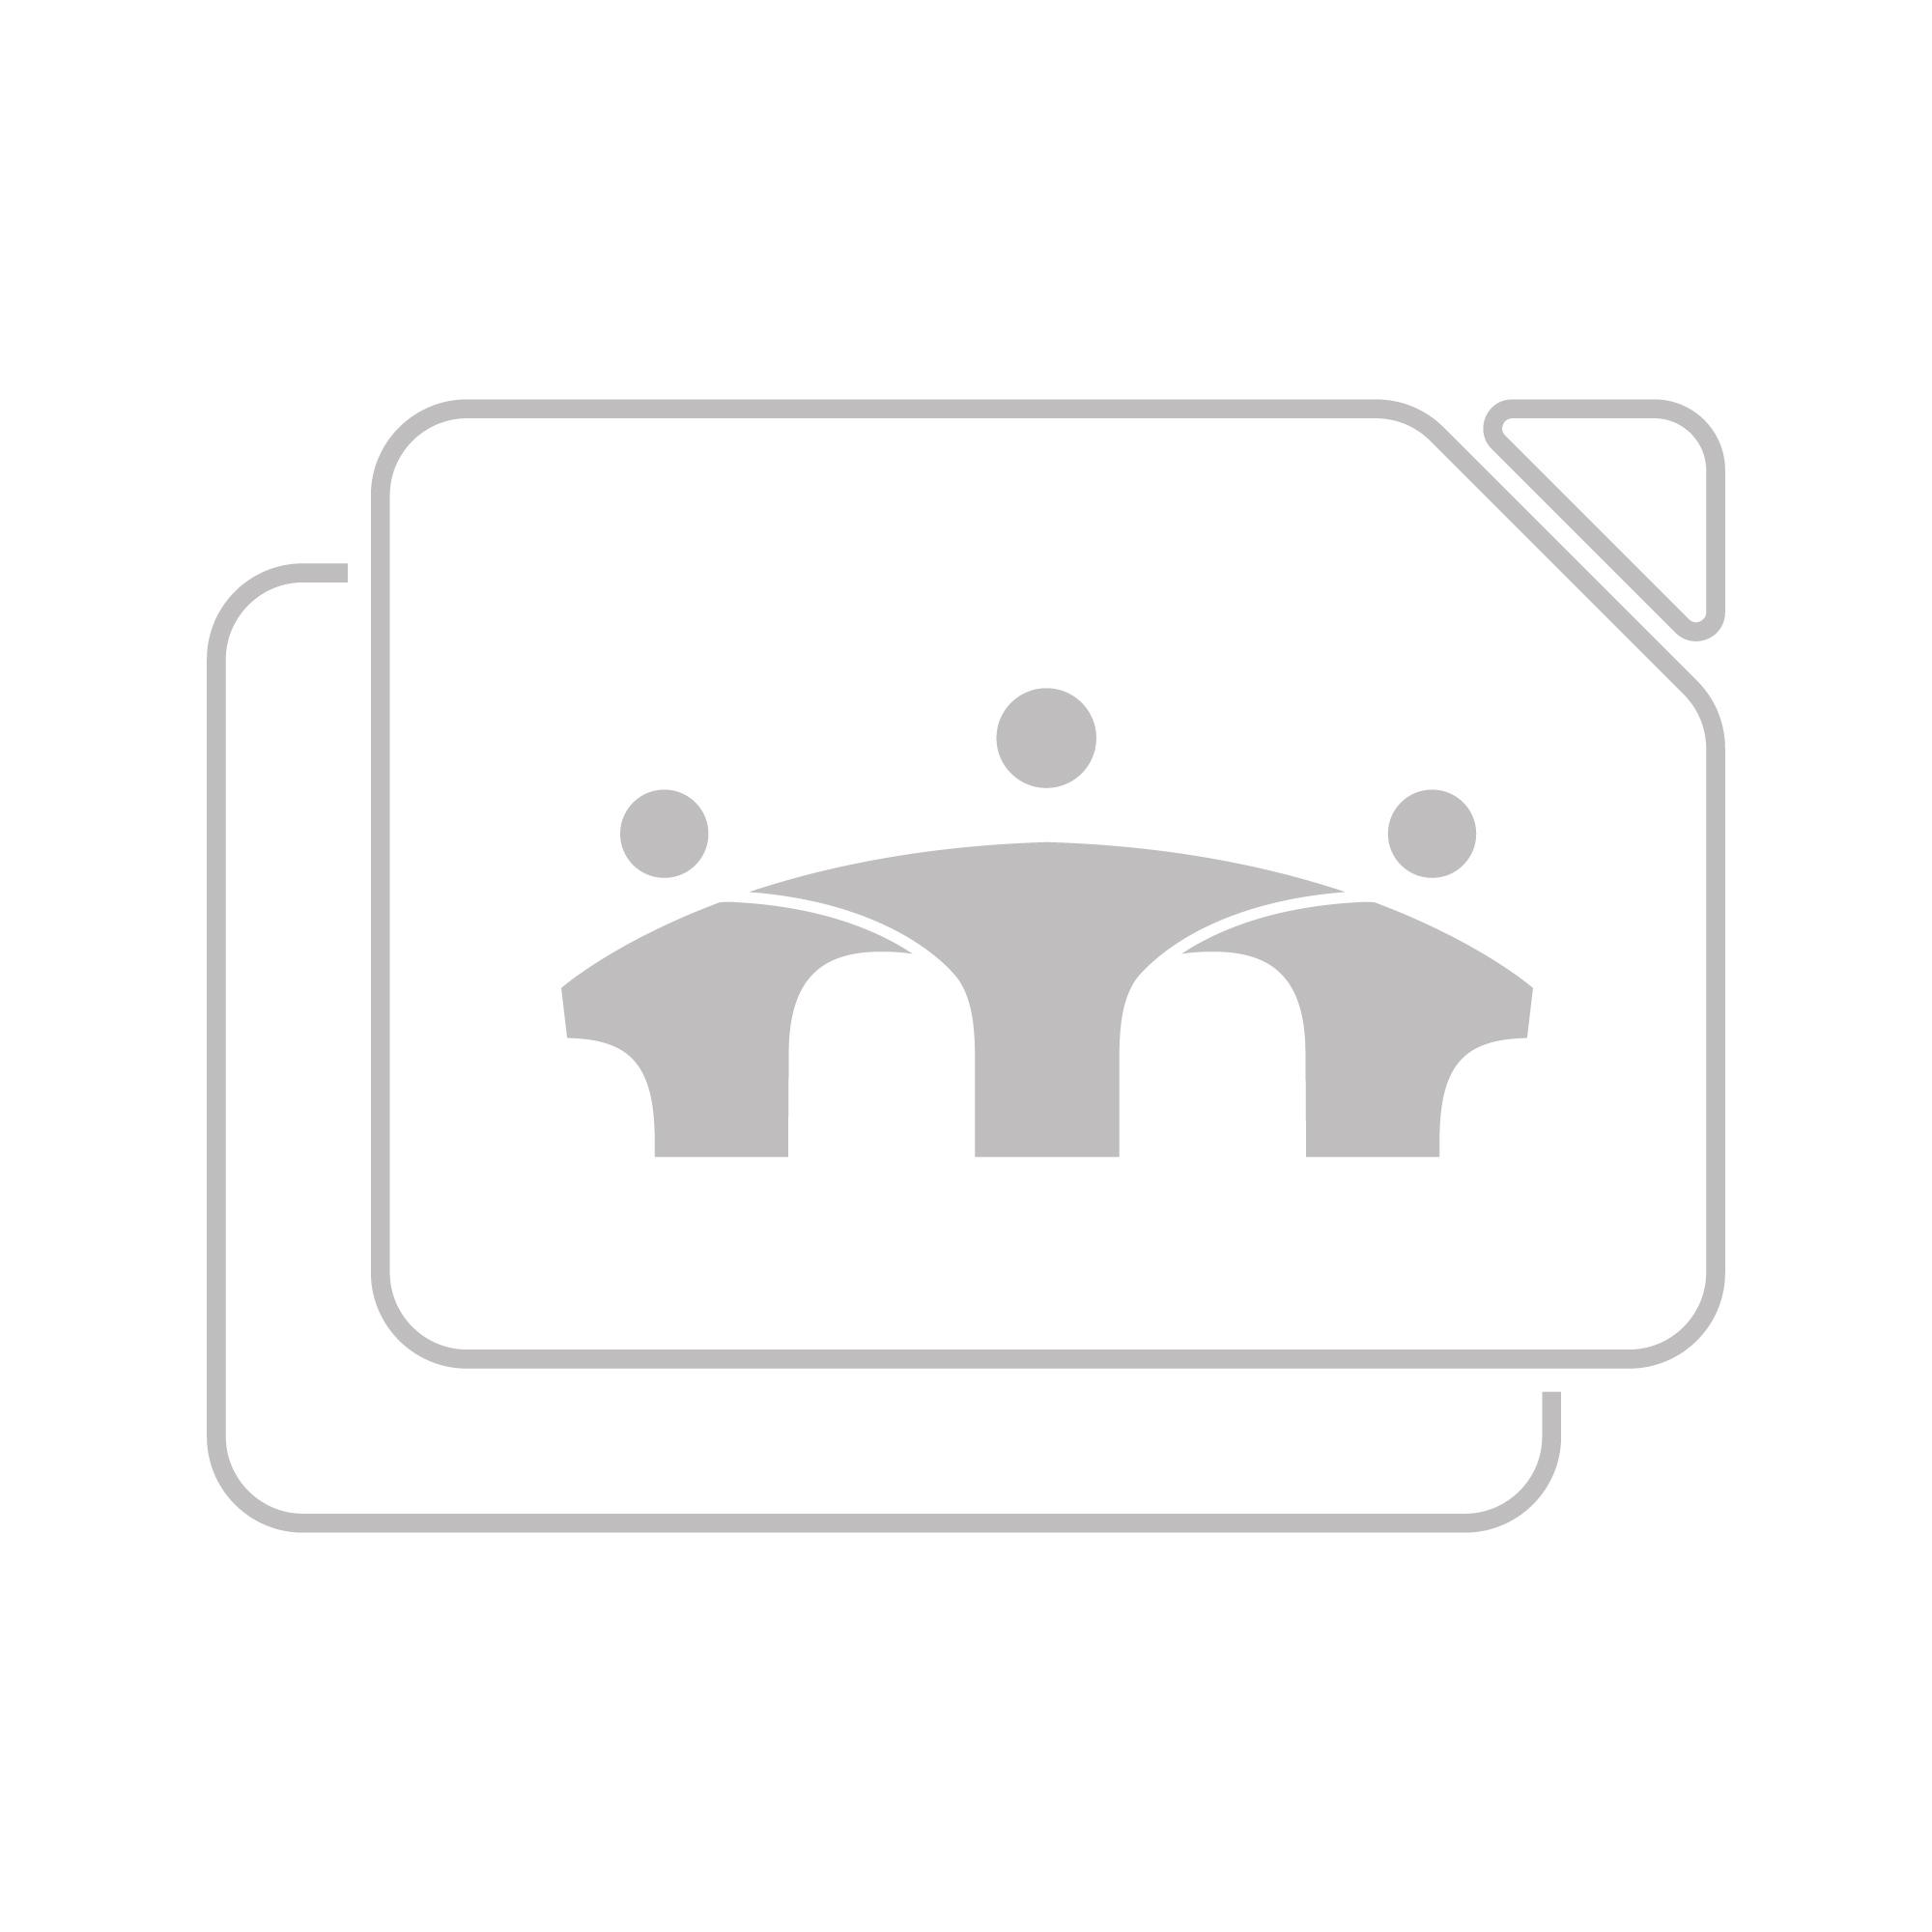 Logitech Logi Zone Wired Earbuds UC - GRAPHITE - EMEA